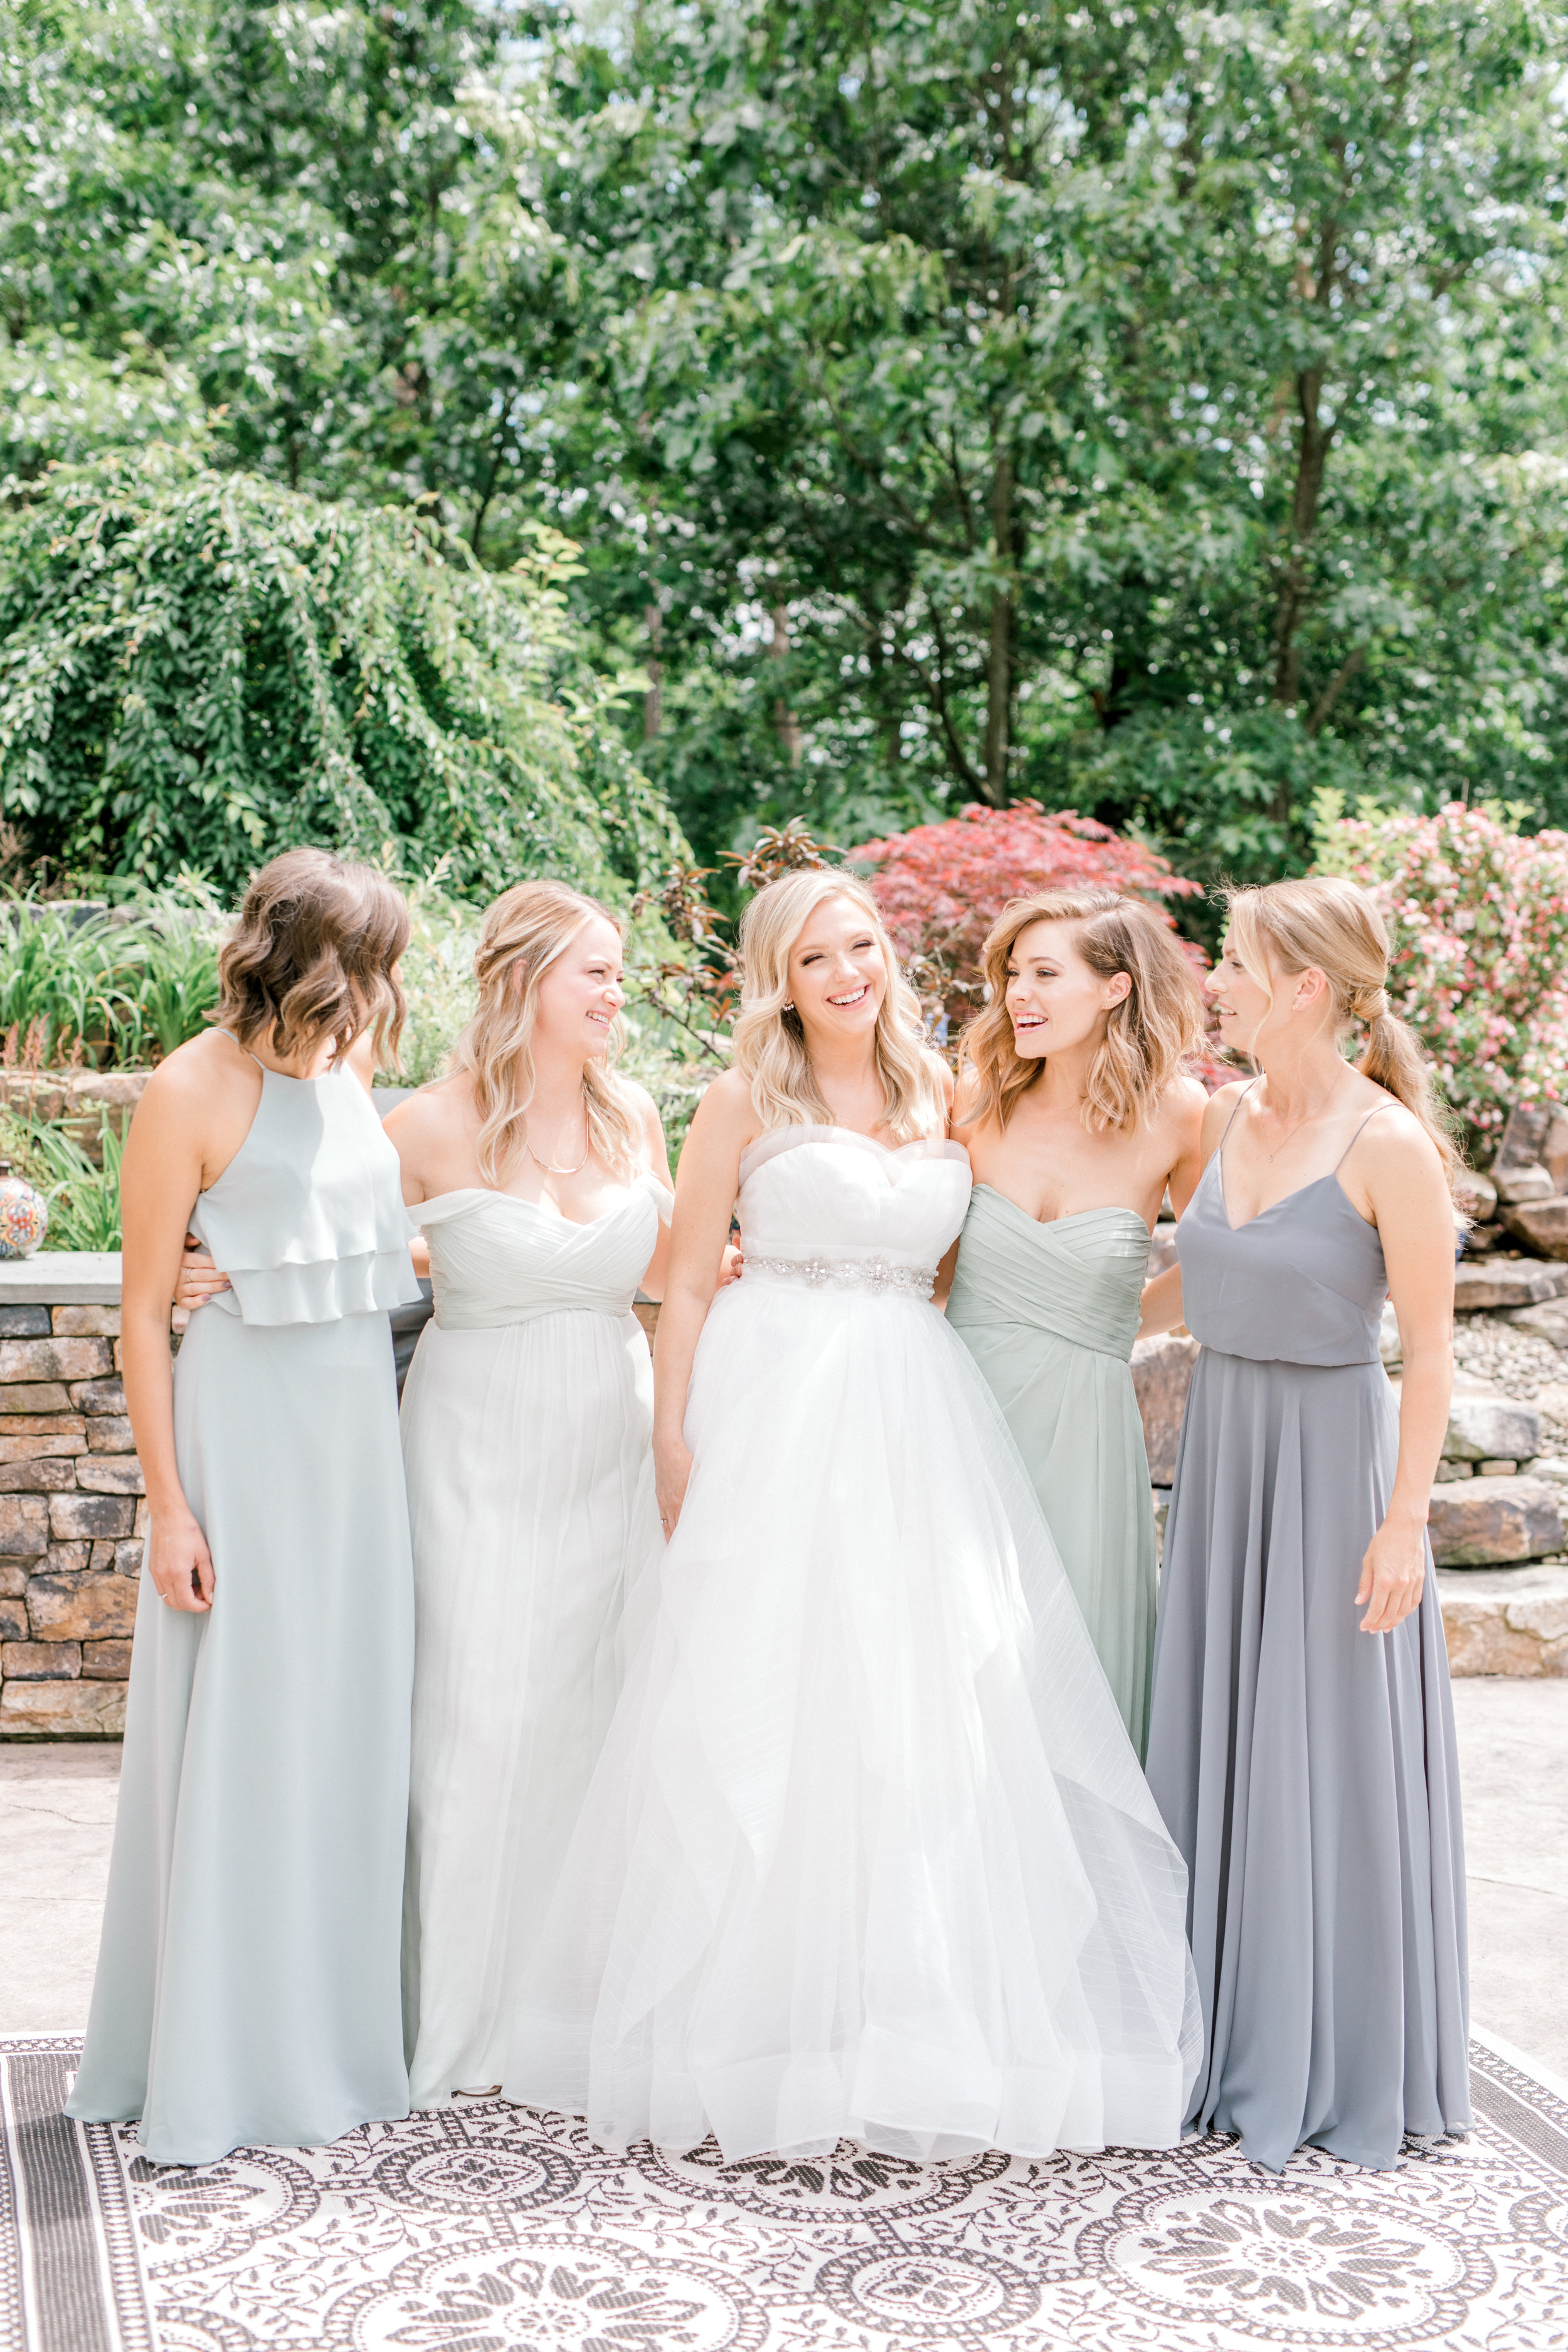 haley-richter-photography-fero-vineyards-summer-wedding-allison-and-josh-winery-pennsylvania-039.jpg